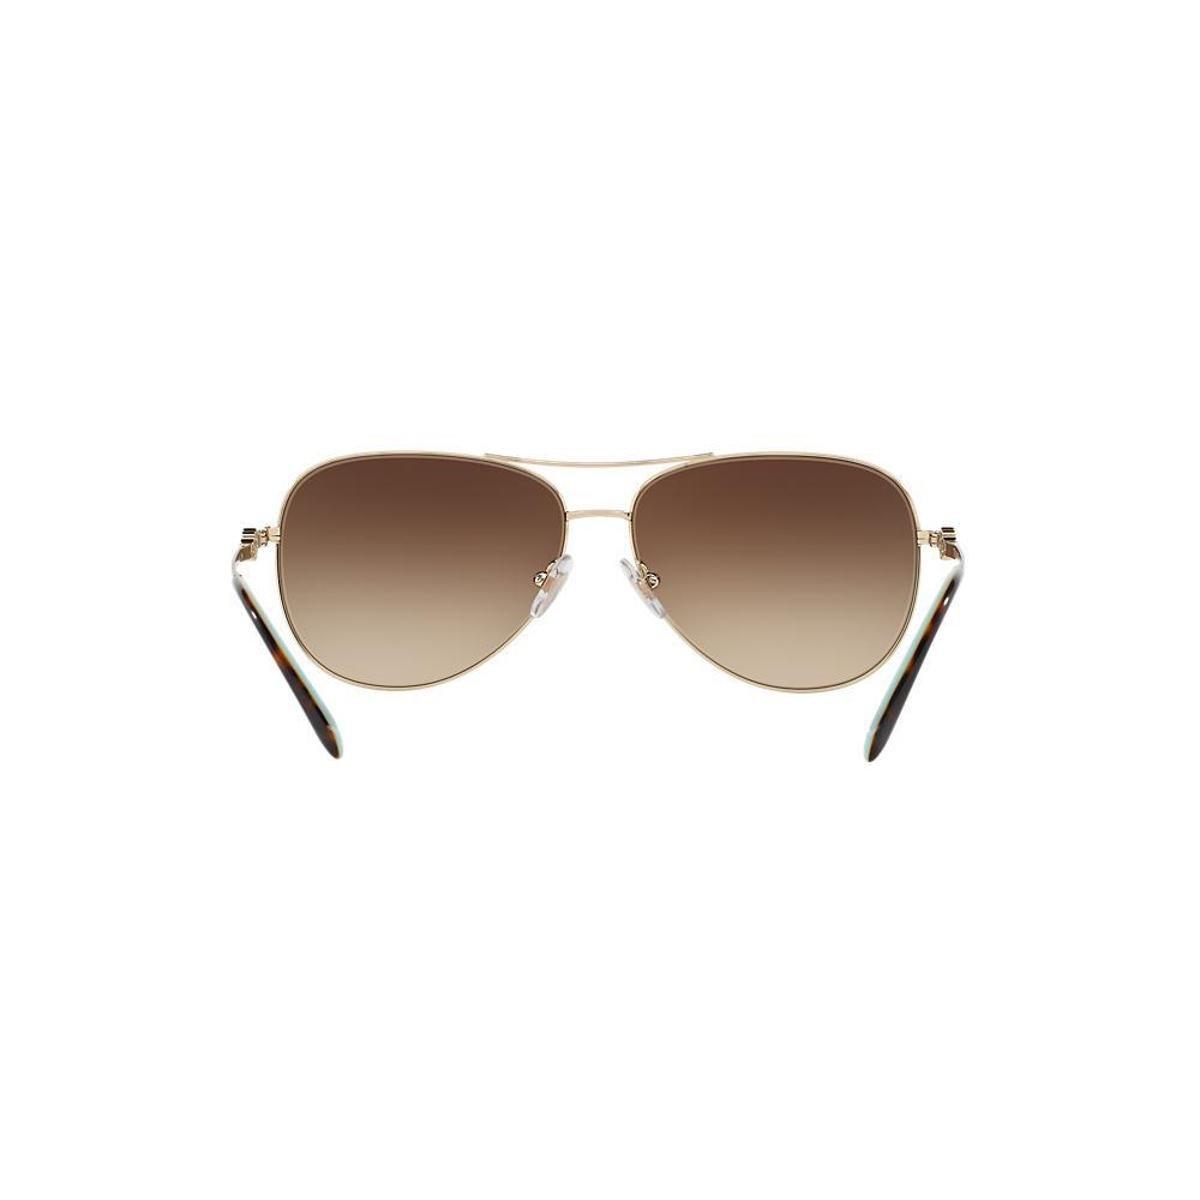 f1863df714307 Óculos de Sol Tiffany   Co. Piloto TF3052B Feminino - Marrom ...